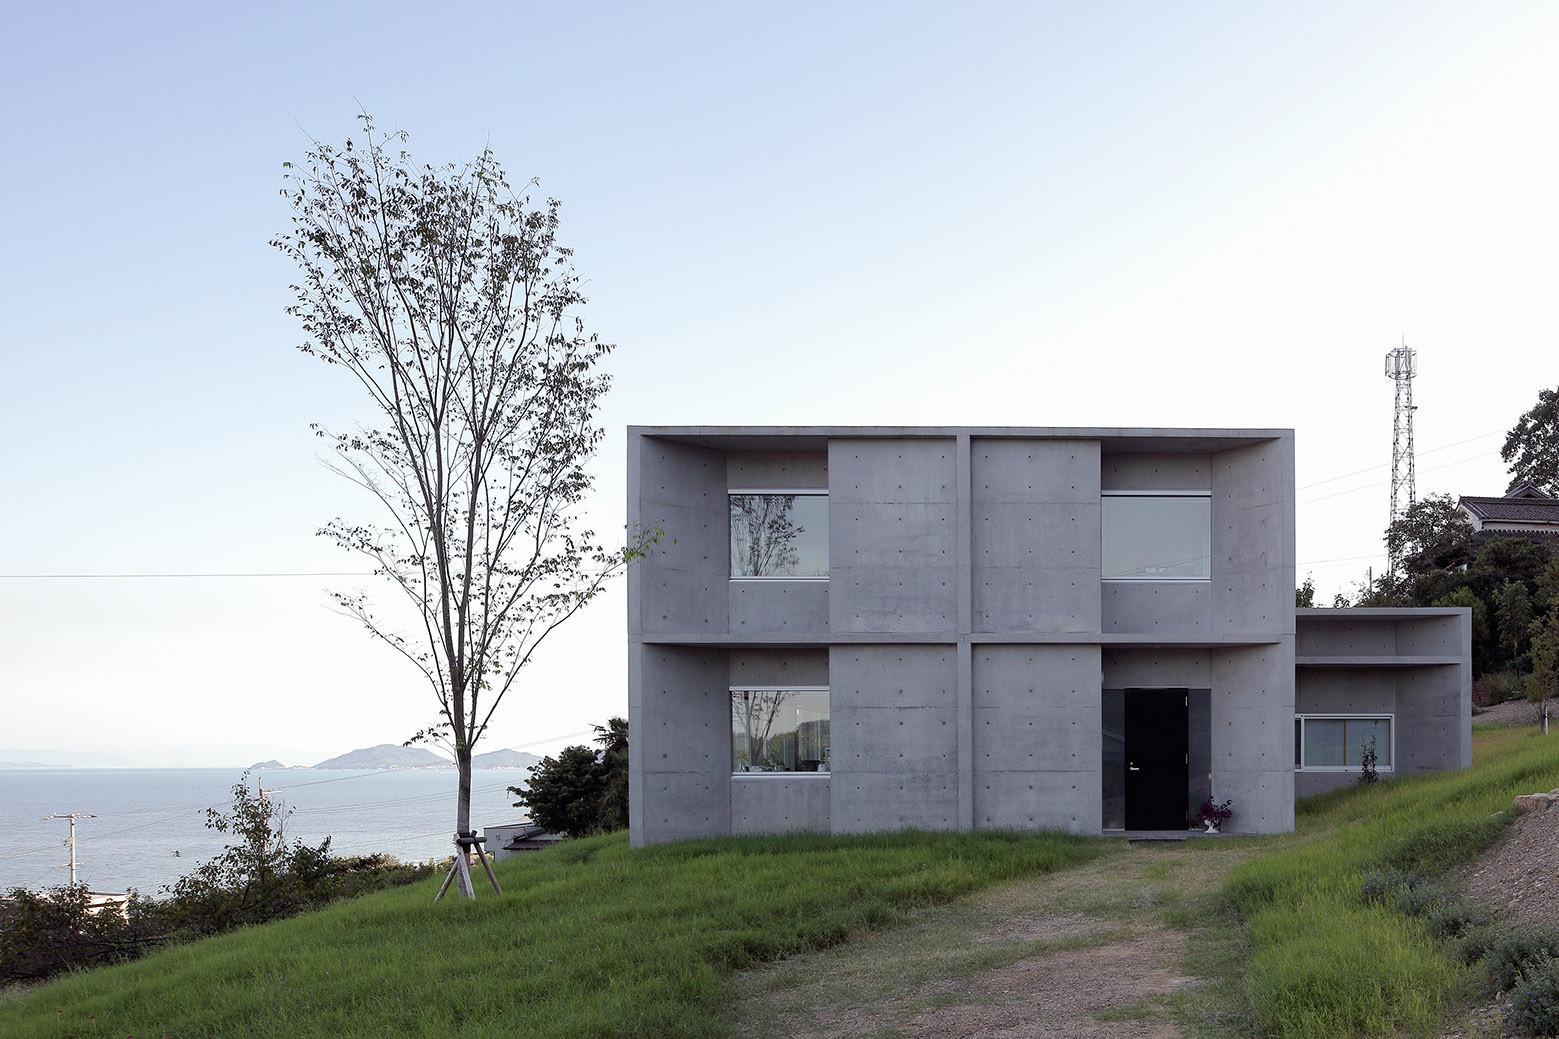 House in Tajiri 2 / Kazunori Fujimoto Architect & Associates, Courtesy of Kazunori Fujimoto Architect & Associates